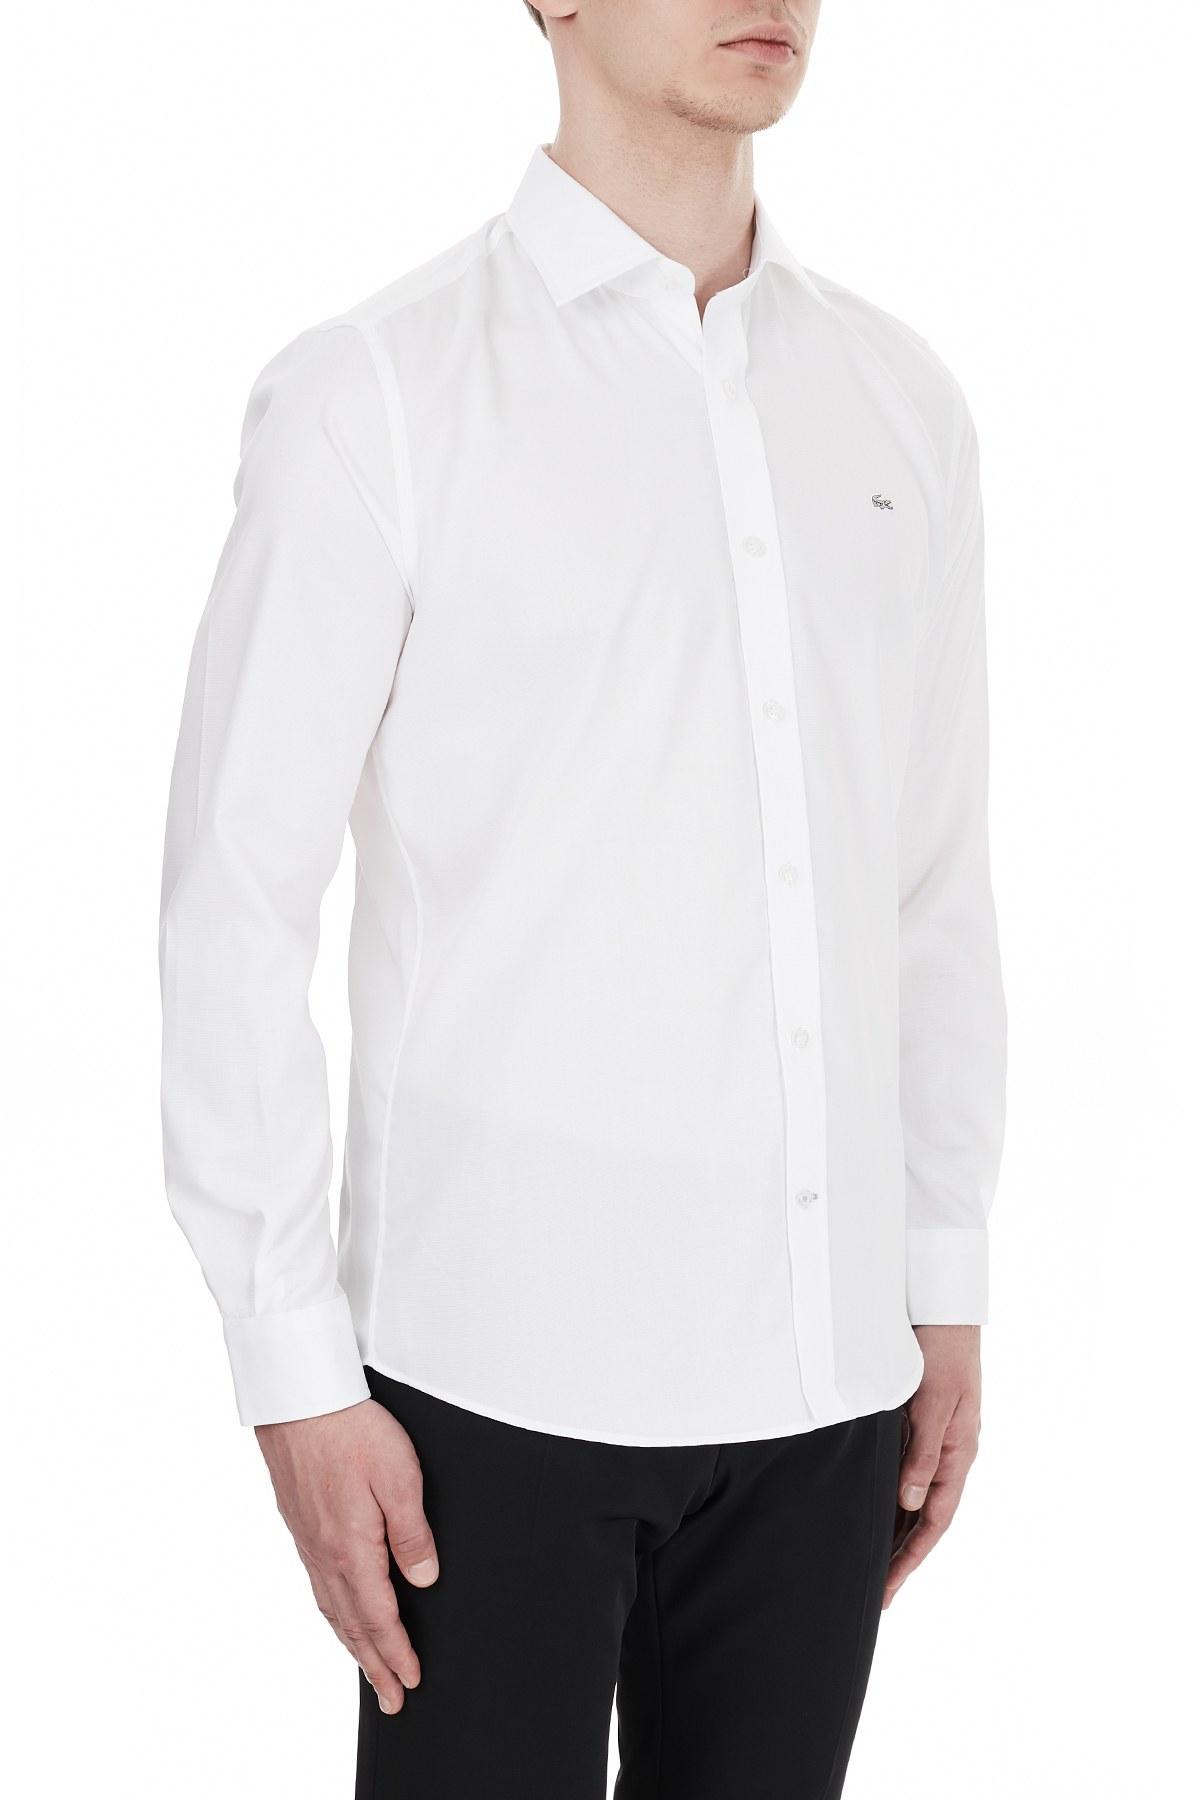 Lacoste Slim Fit Düz Yaka % 100 Pamuk Erkek Gömlek CH6122 800 BEYAZ